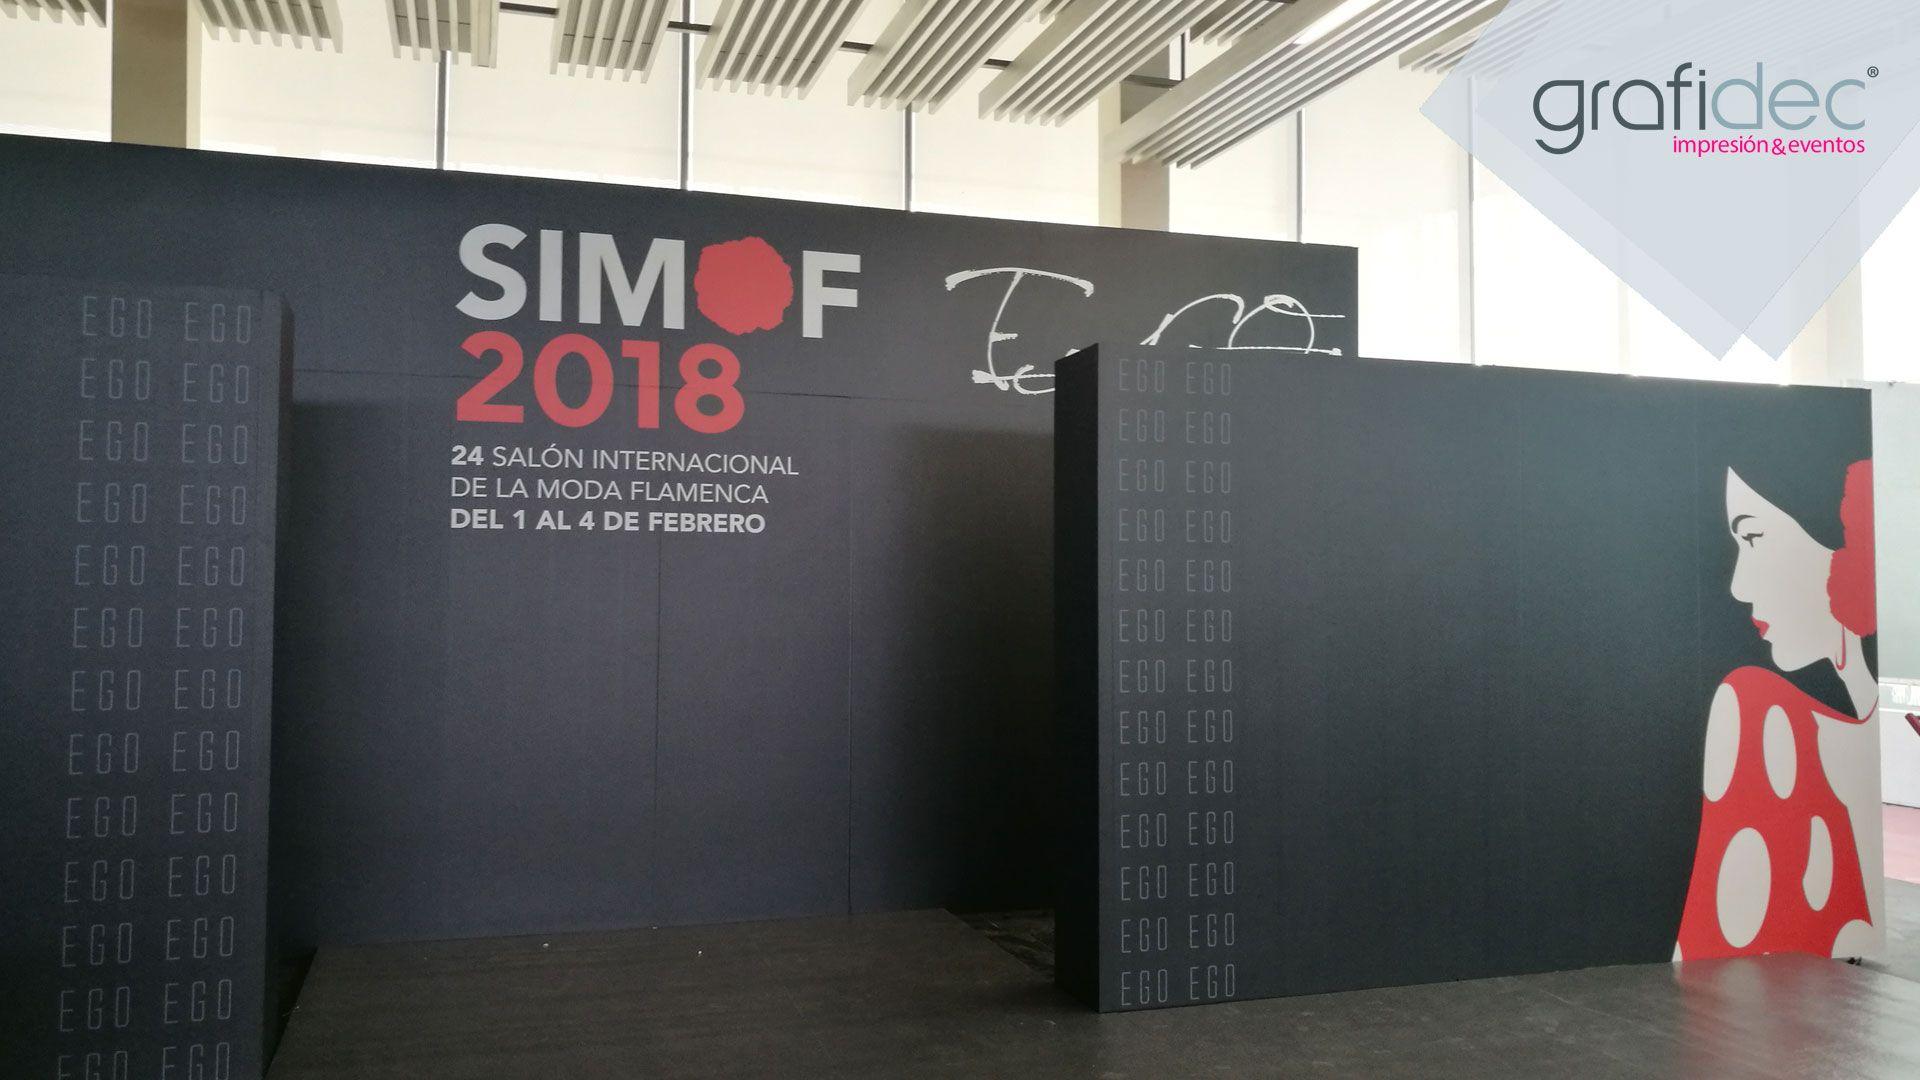 impresión-digital-gran-formato-sevilla-grafidec-SIMOF-6